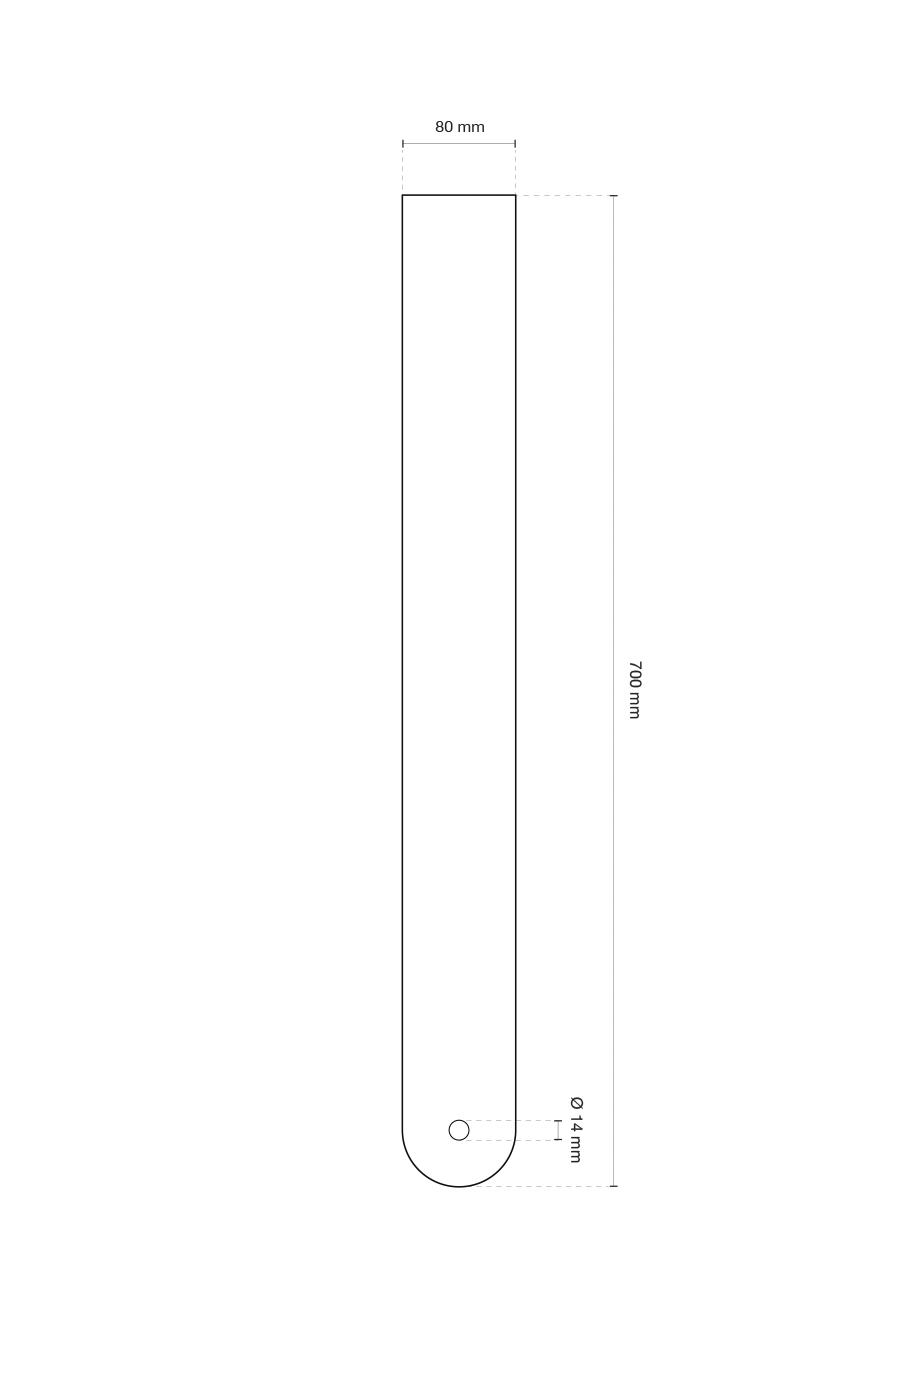 bitpart-dimensions-long d-backplate.jpg